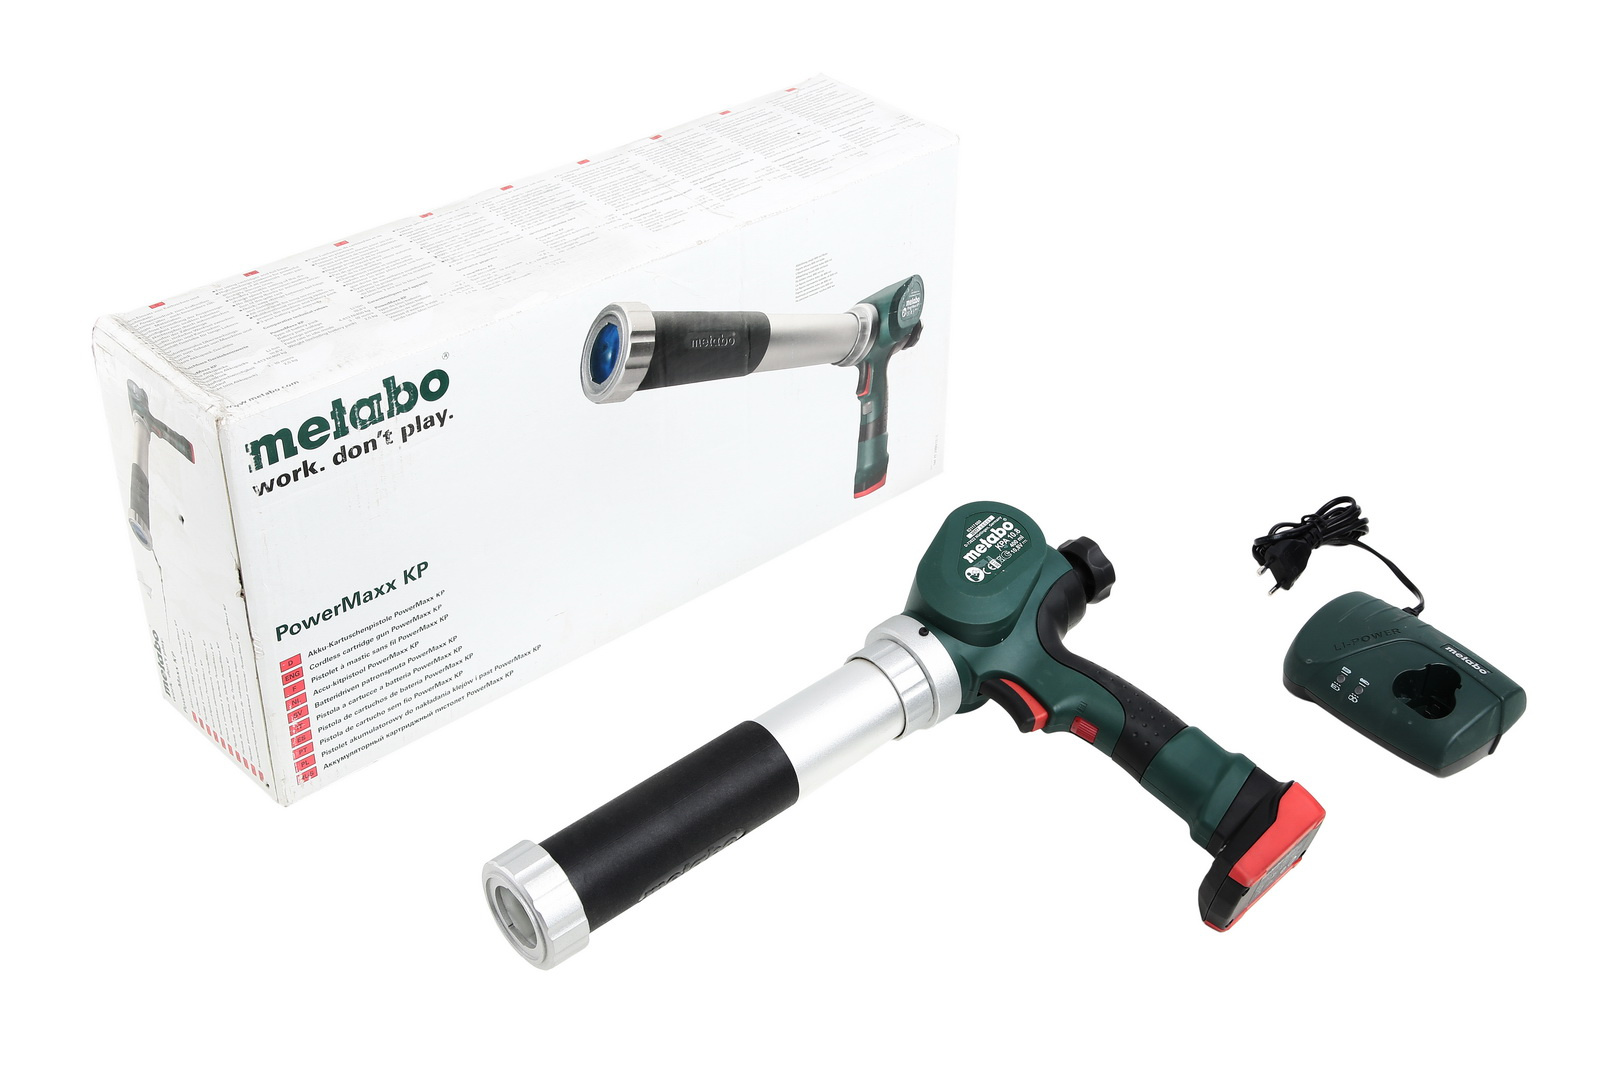 Аккумуляторный пистолет для герметика Metabo Powermaxx kpa (602117610)